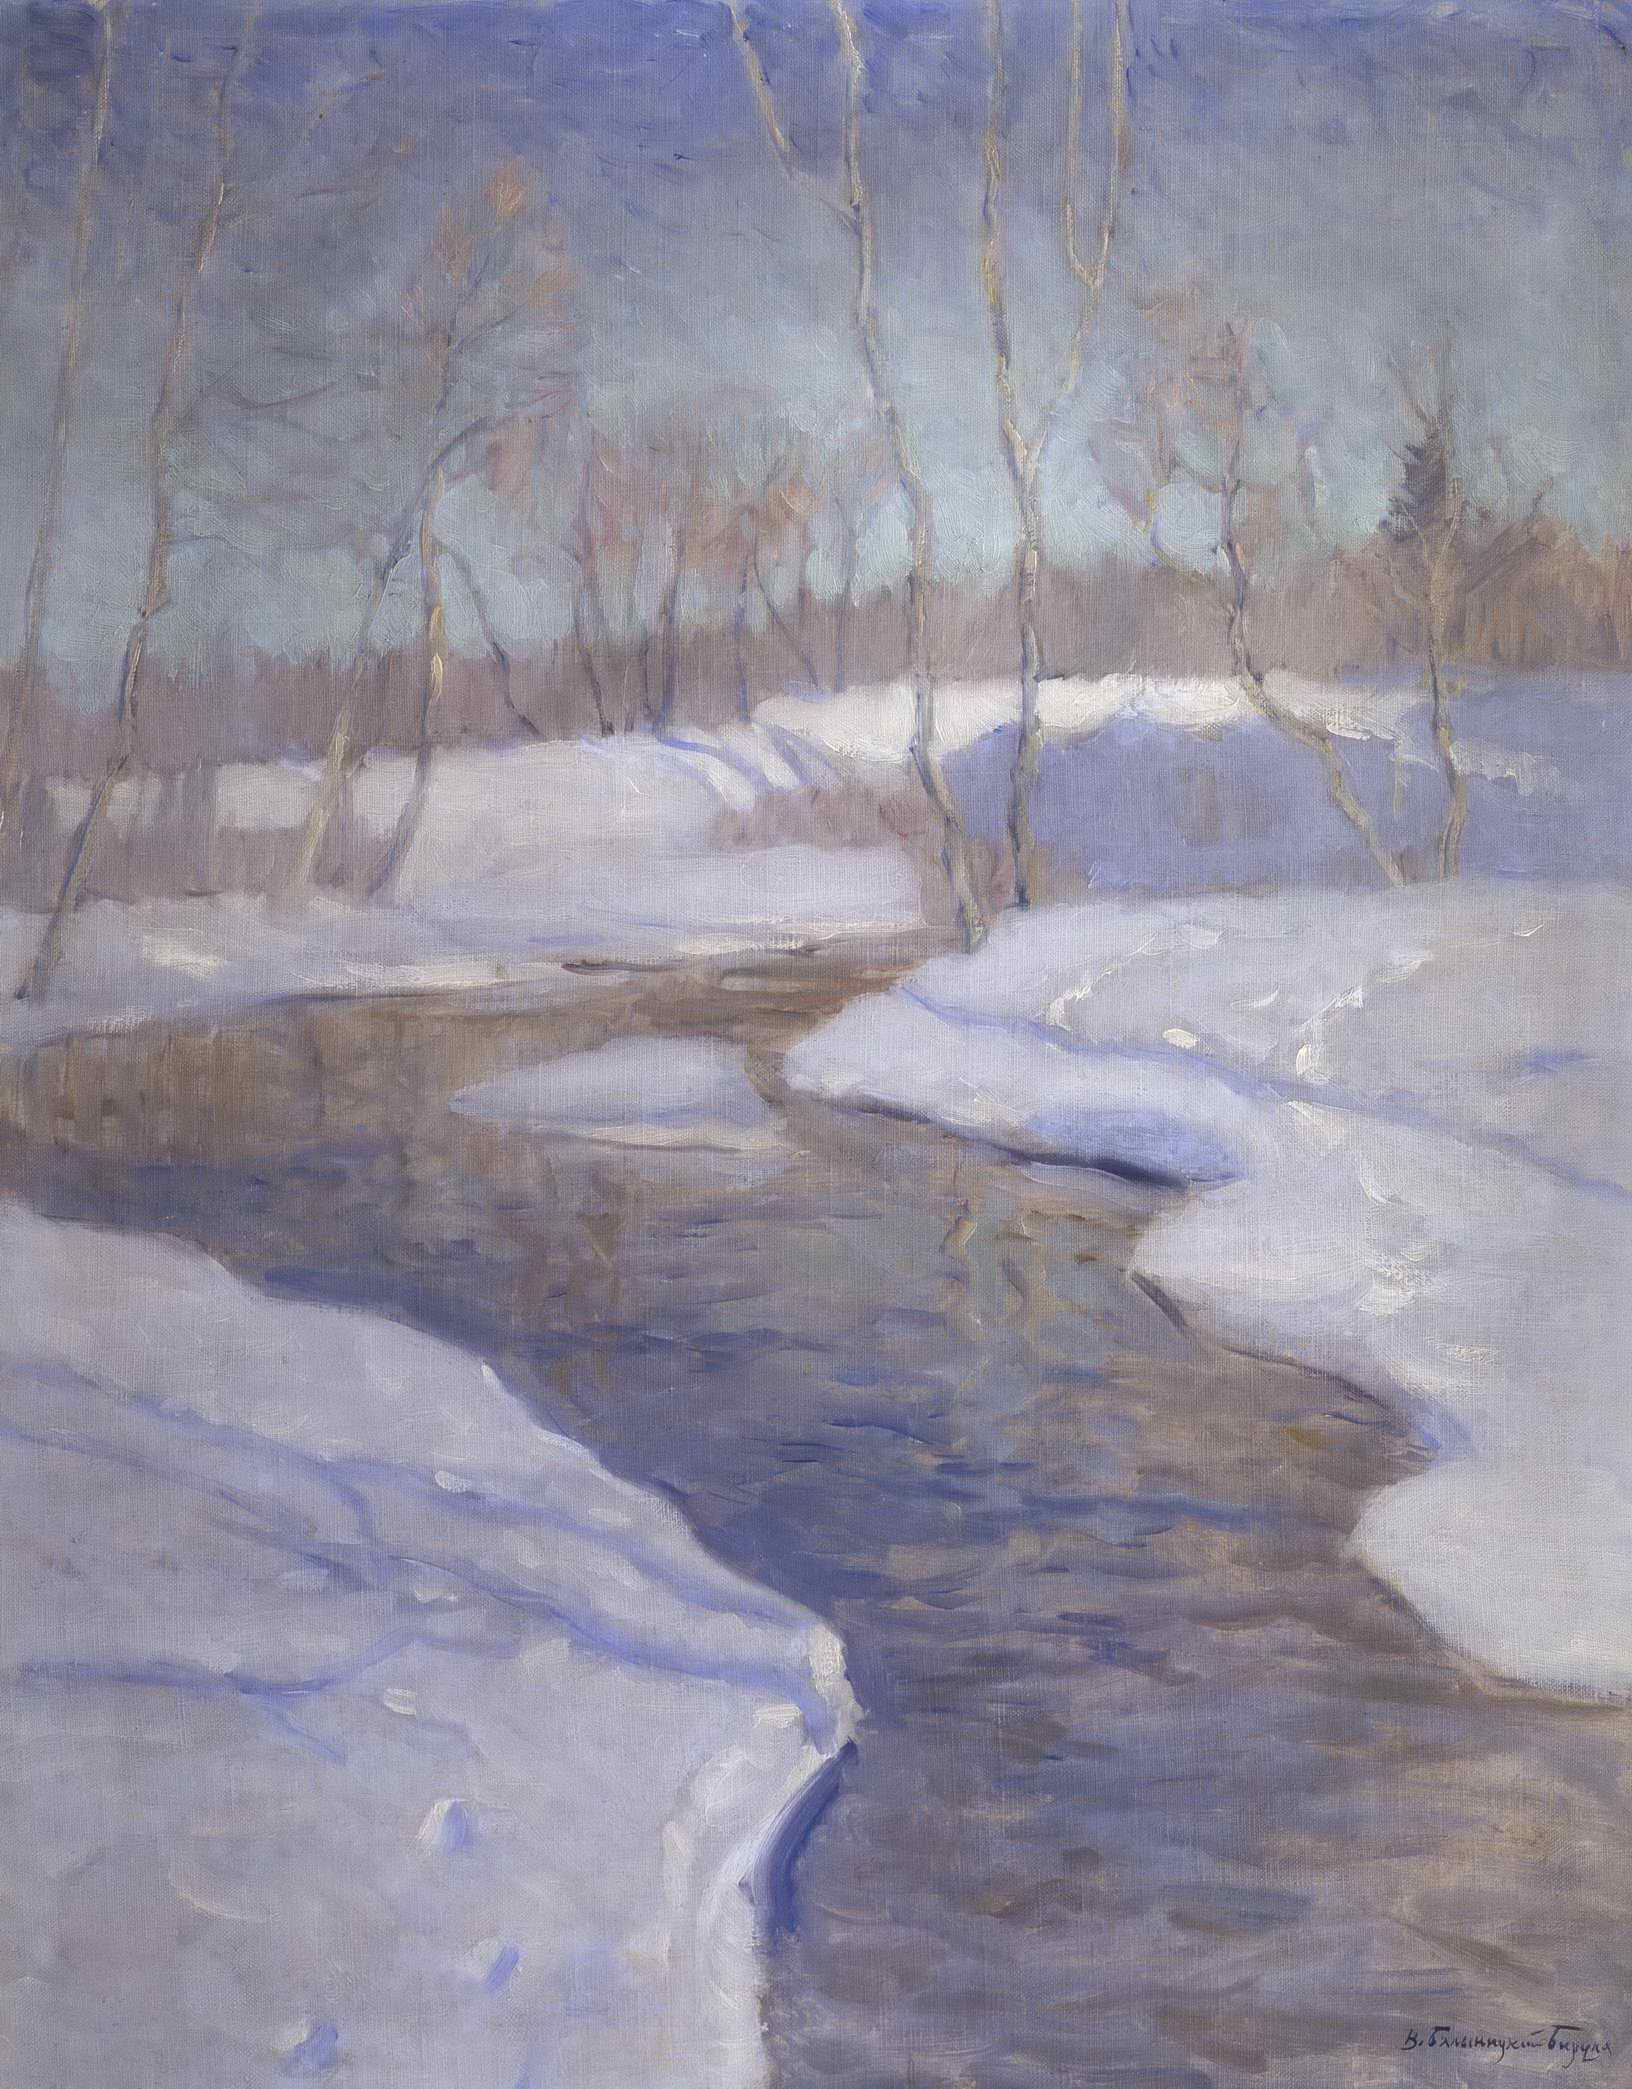 Бялыницкий-Бируля В.К. - Зимний пейзаж с рекою